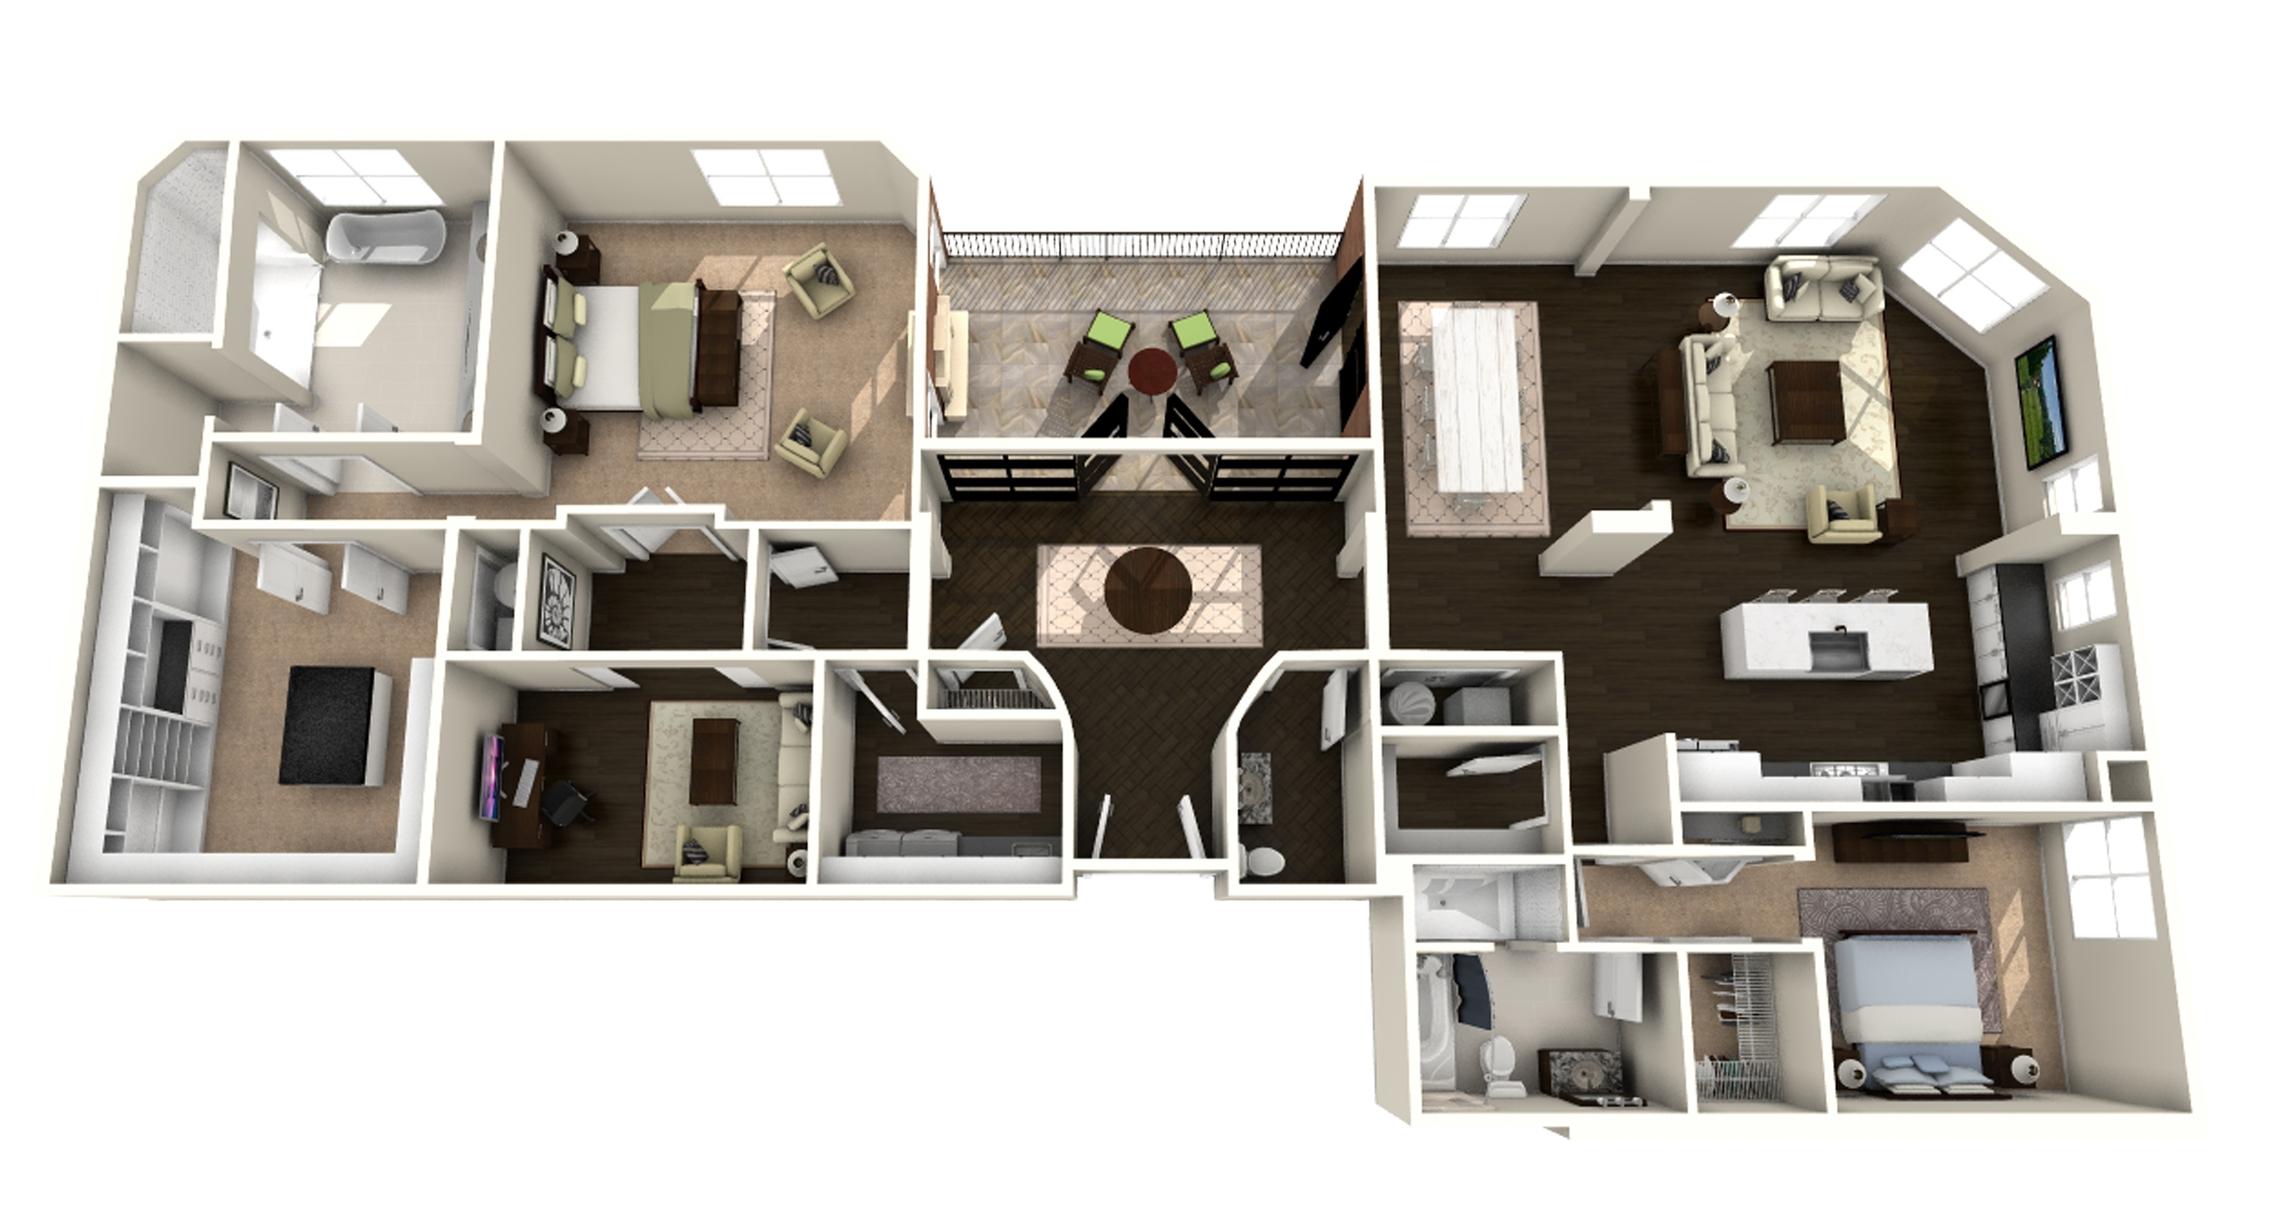 Crescent Dilworth_Interior Floorplan Rendering.jpg